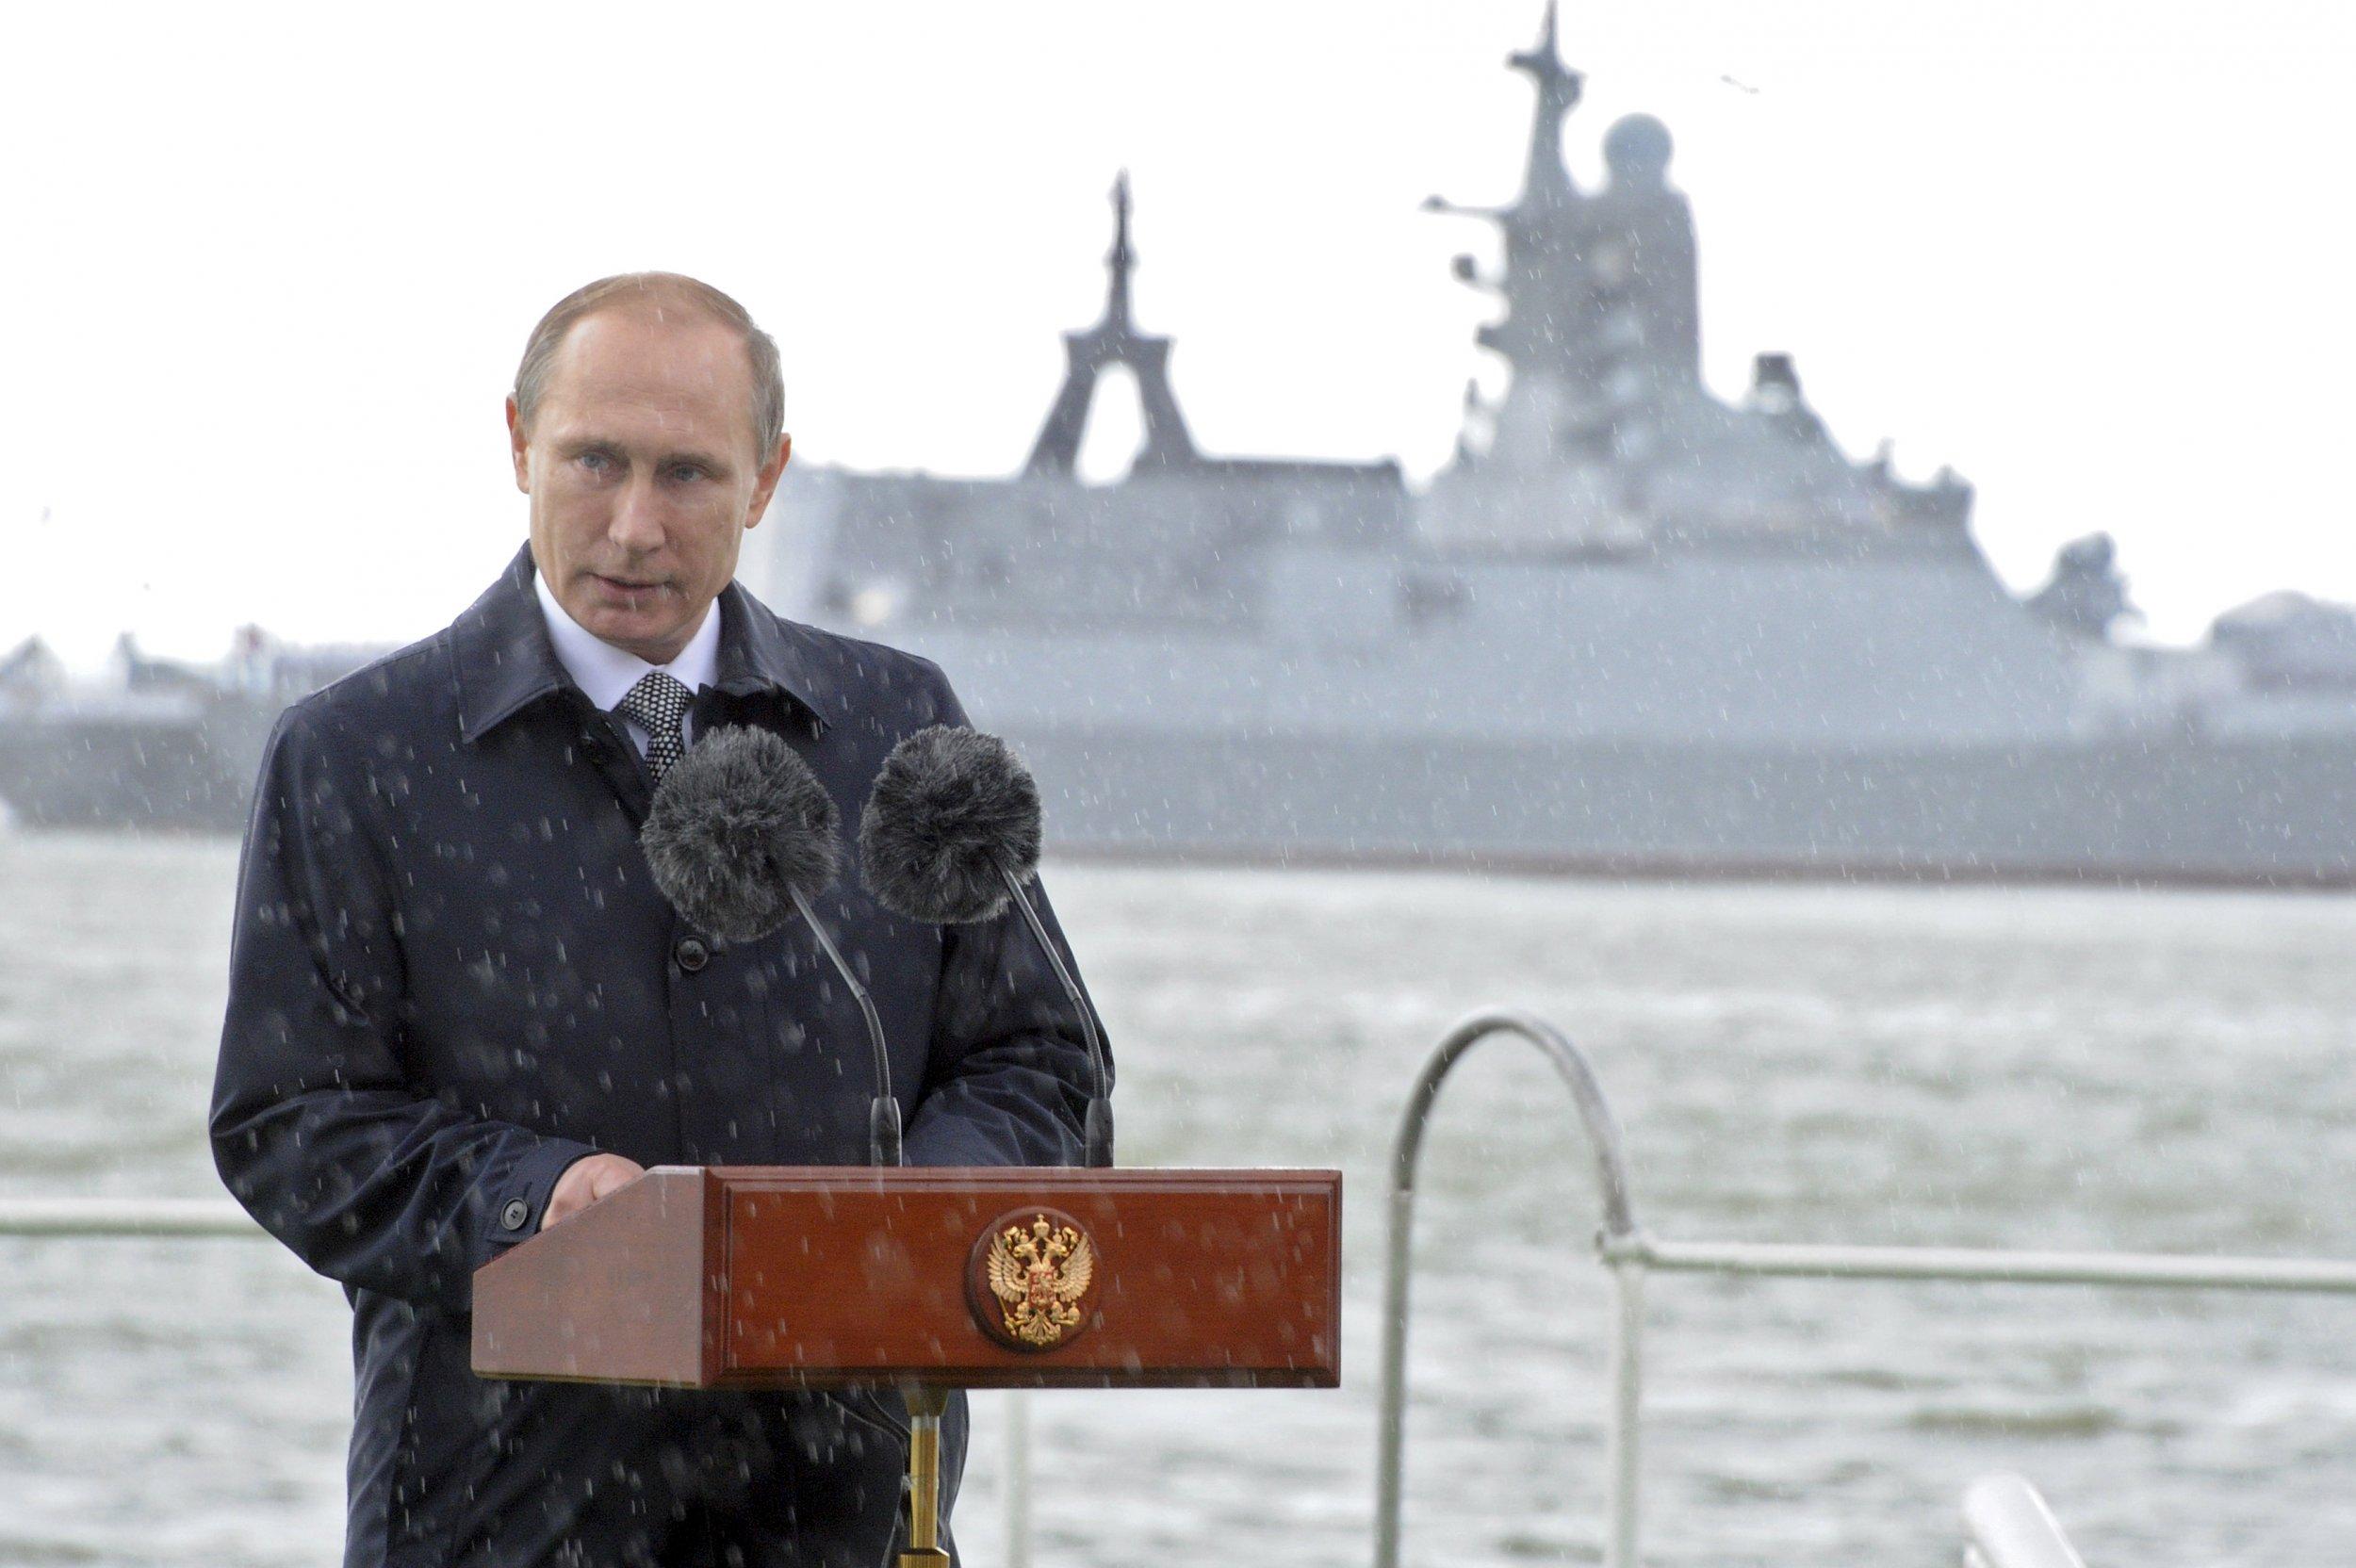 10_02_Russian_navy_01